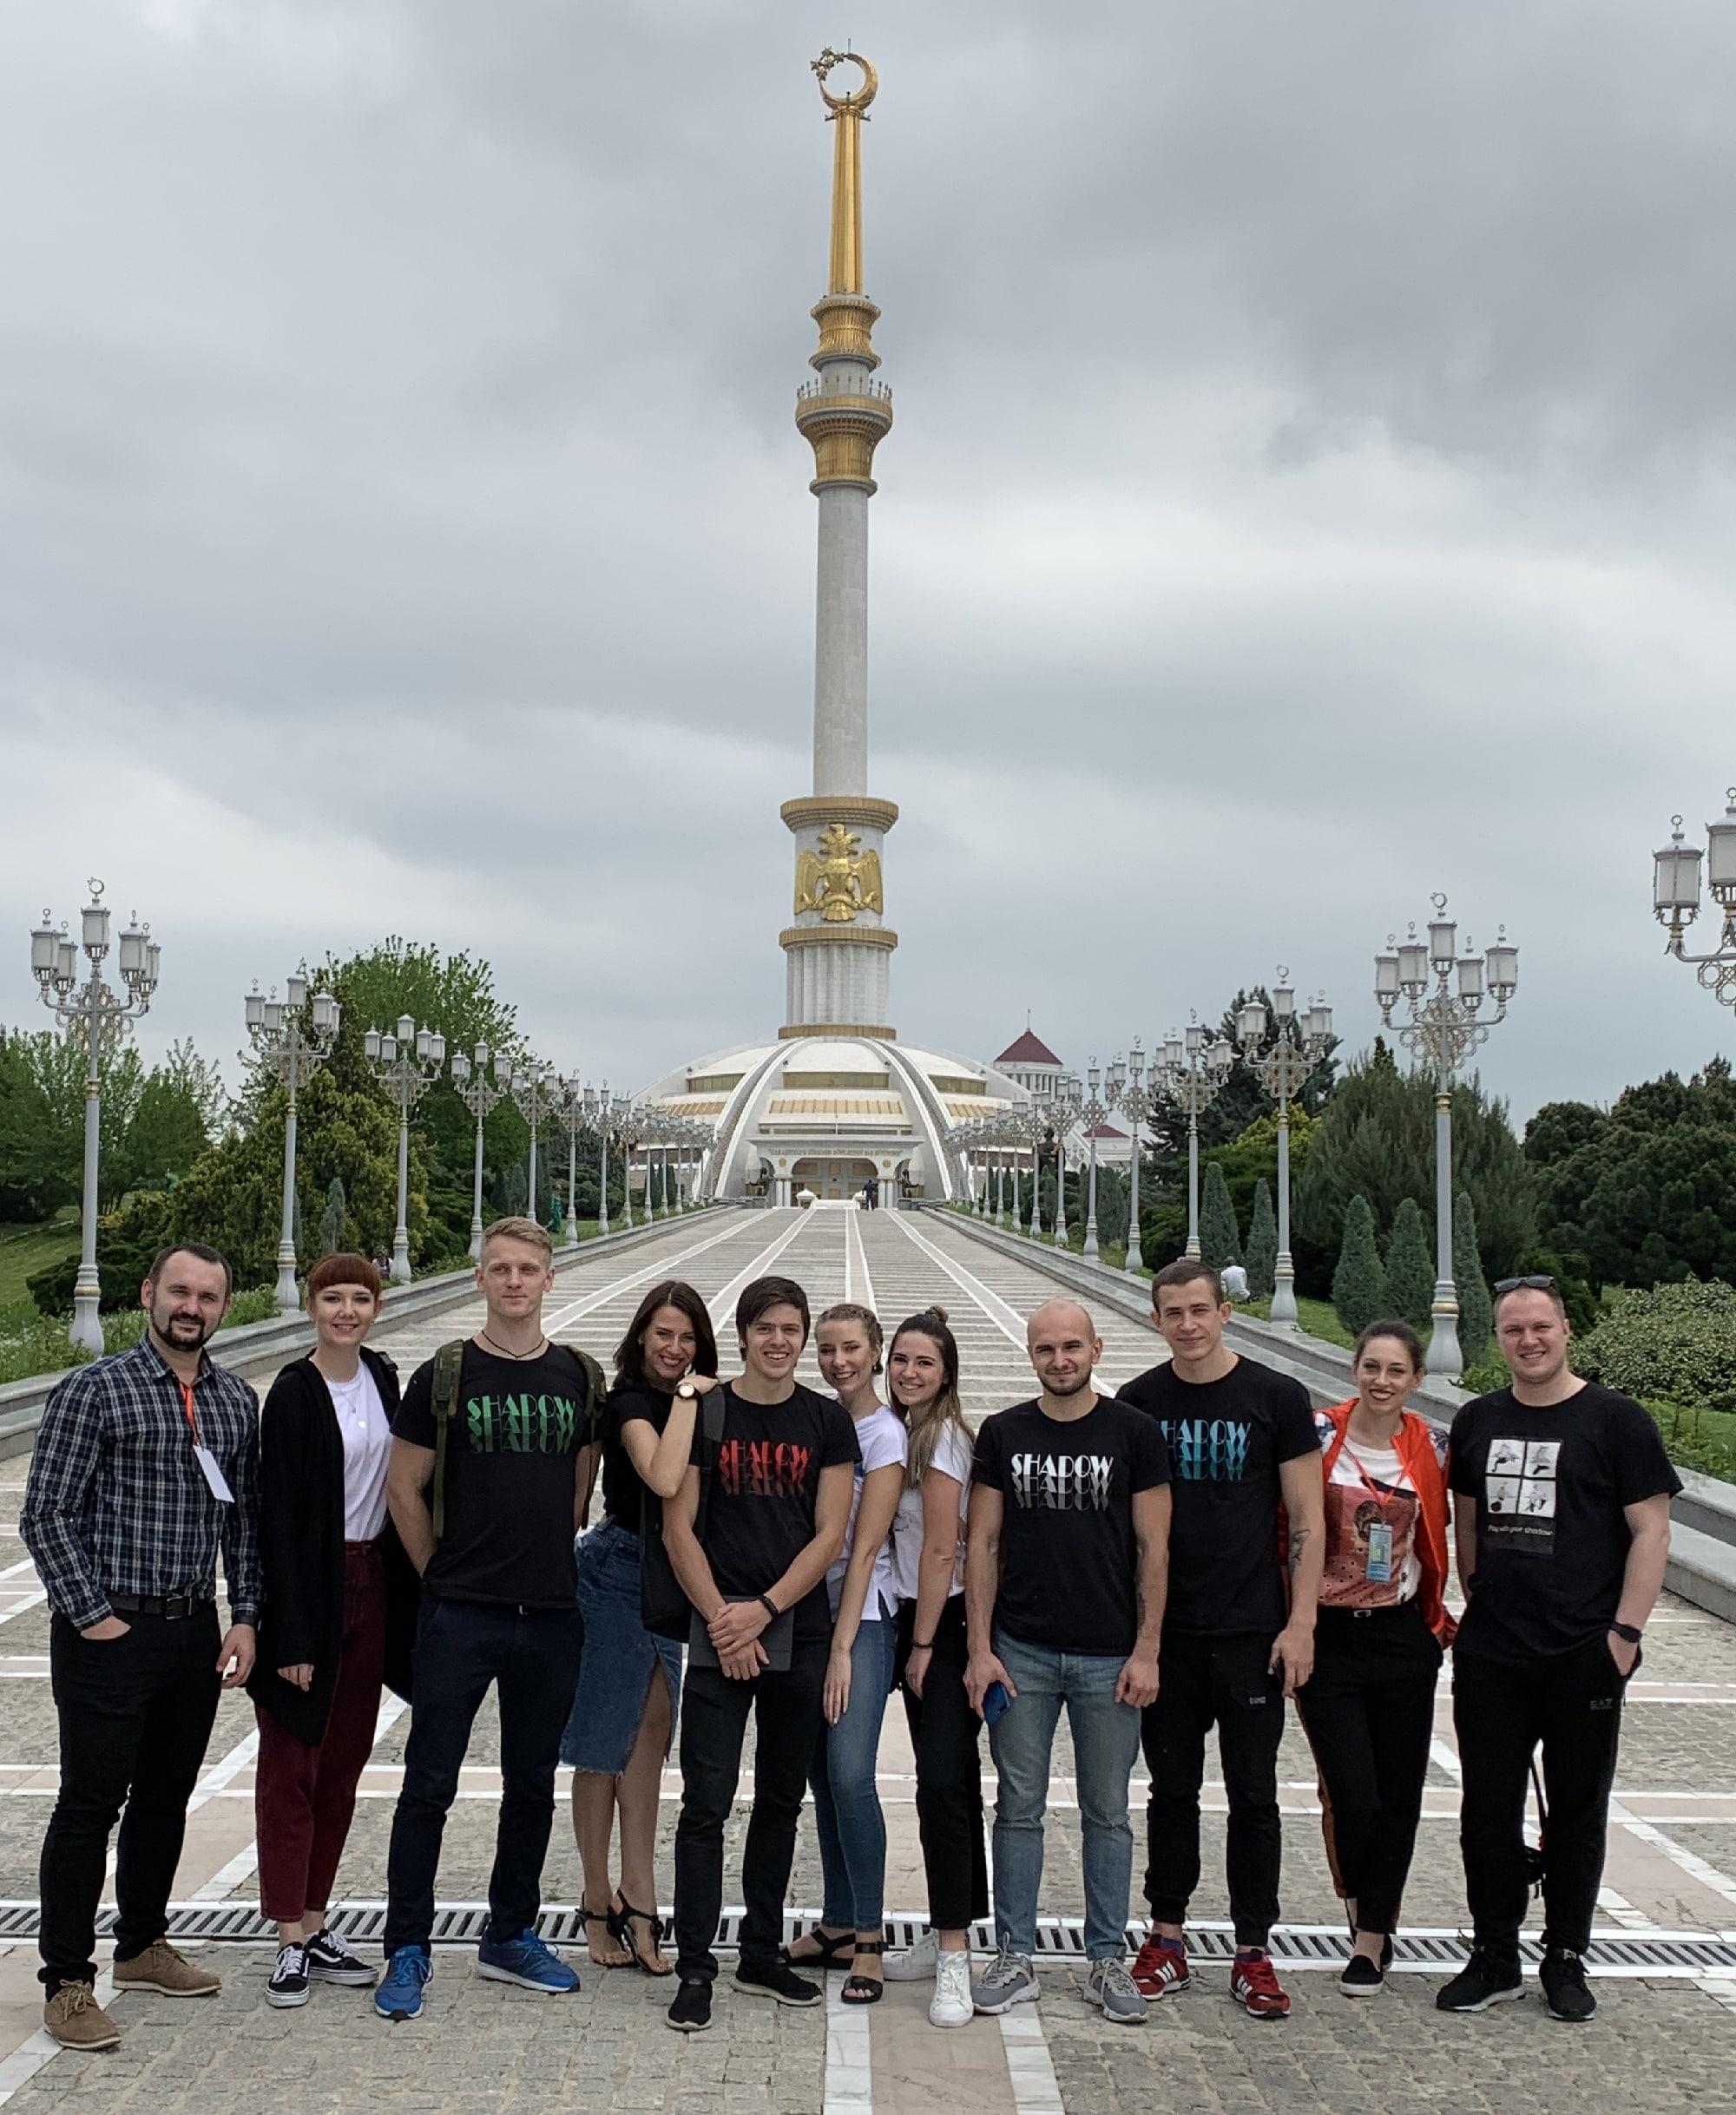 театр теней на Söwda we hyzmat - 2019 shadow theatre in Turmenistan